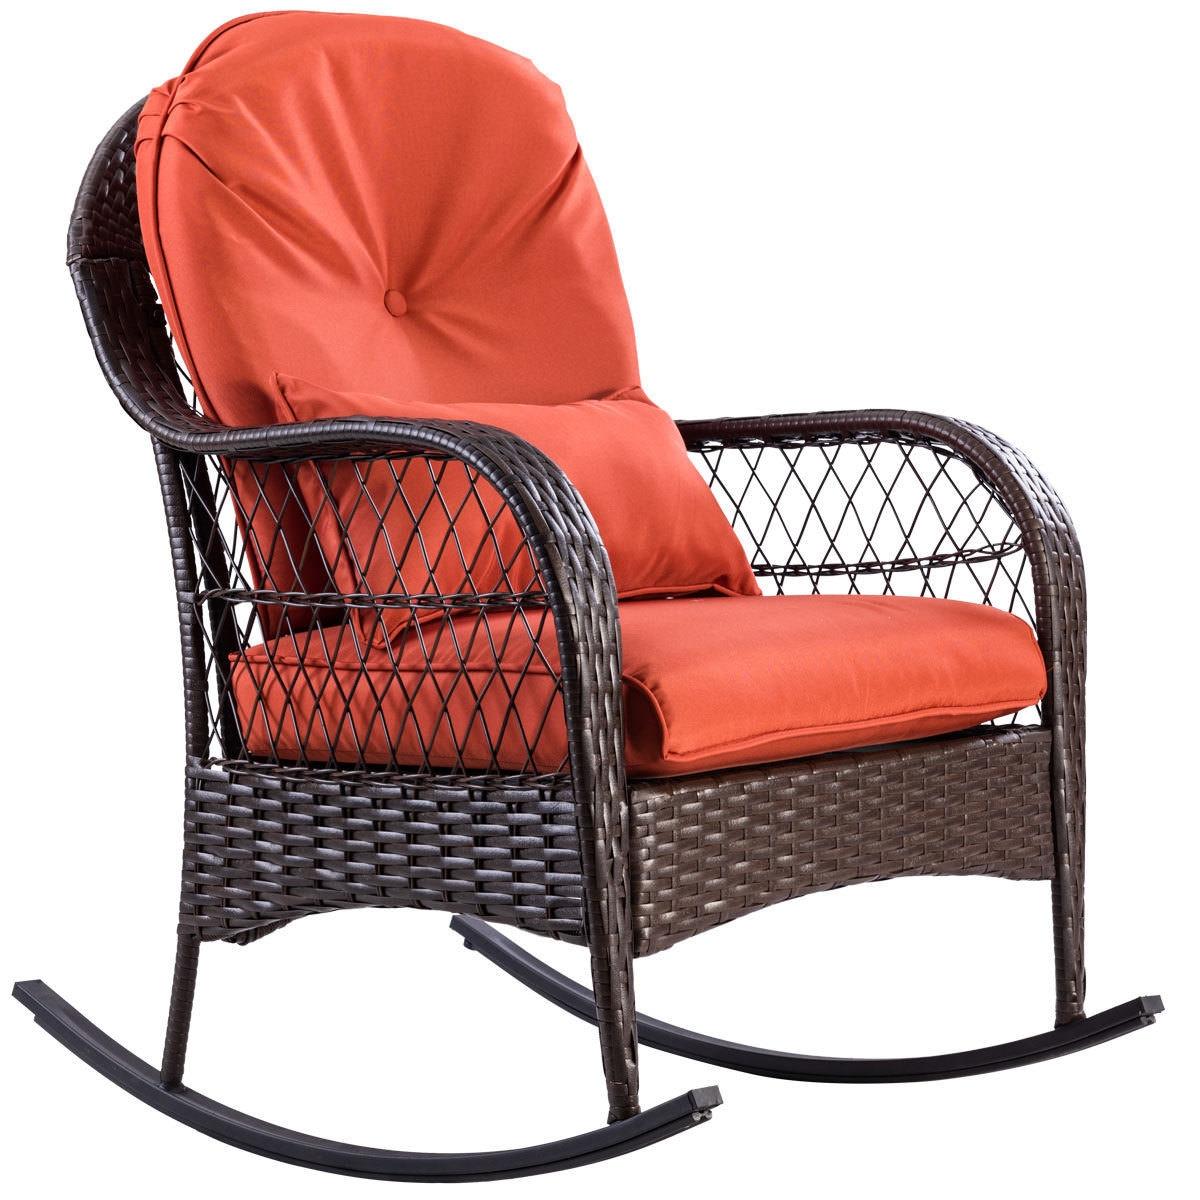 Outdoor Wicker Rocking Chair w/ Cushion